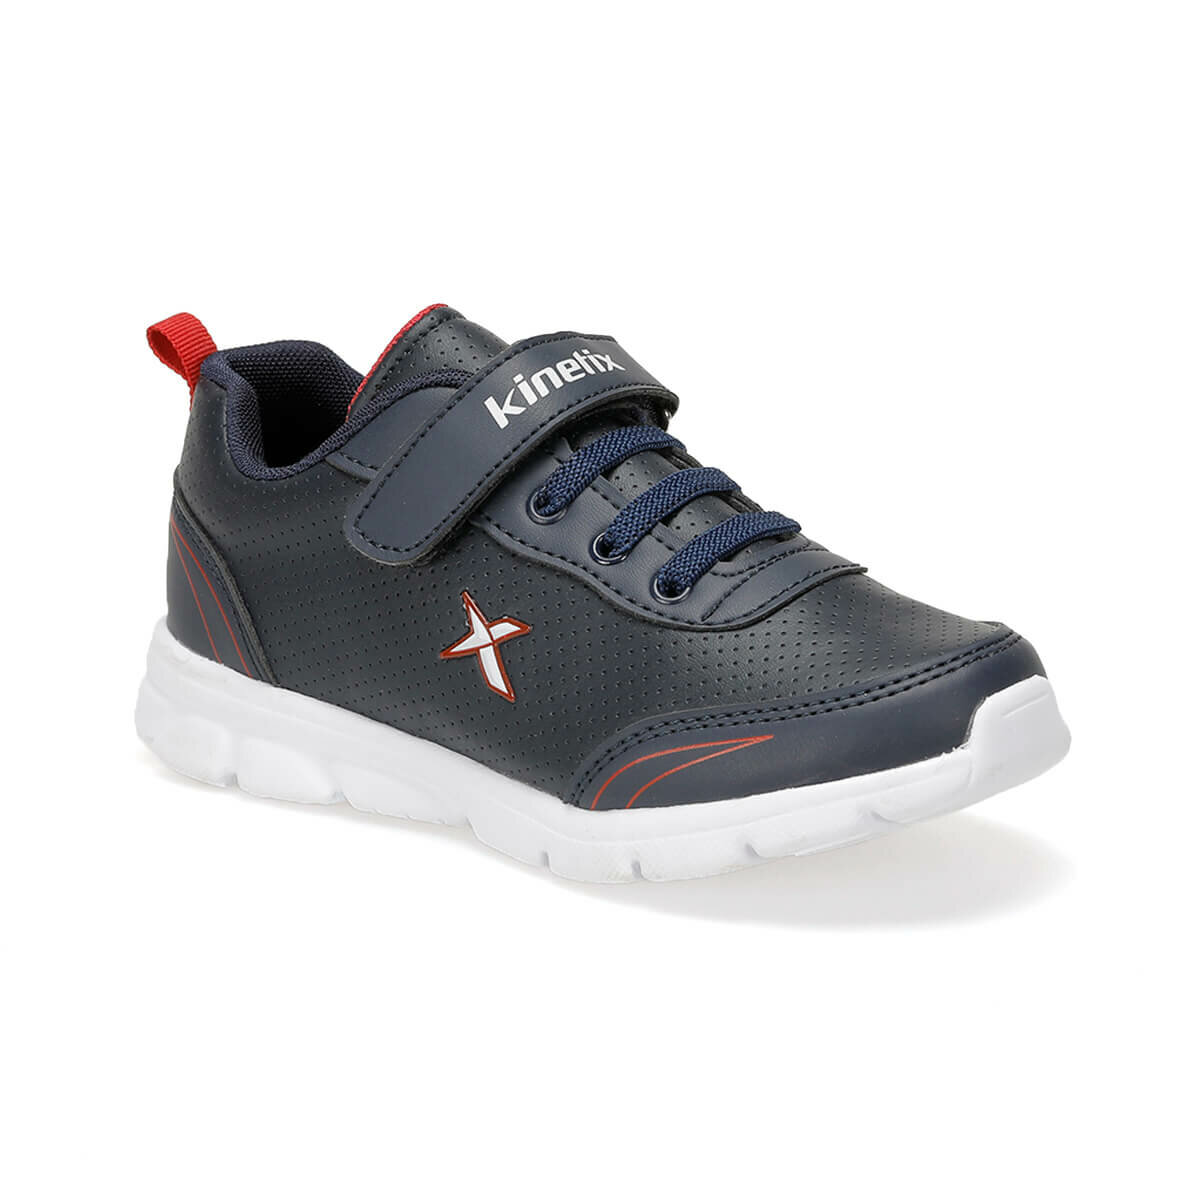 FLO YANNI PU 9PR Navy Blue Male Child Hiking Shoes KINETIX